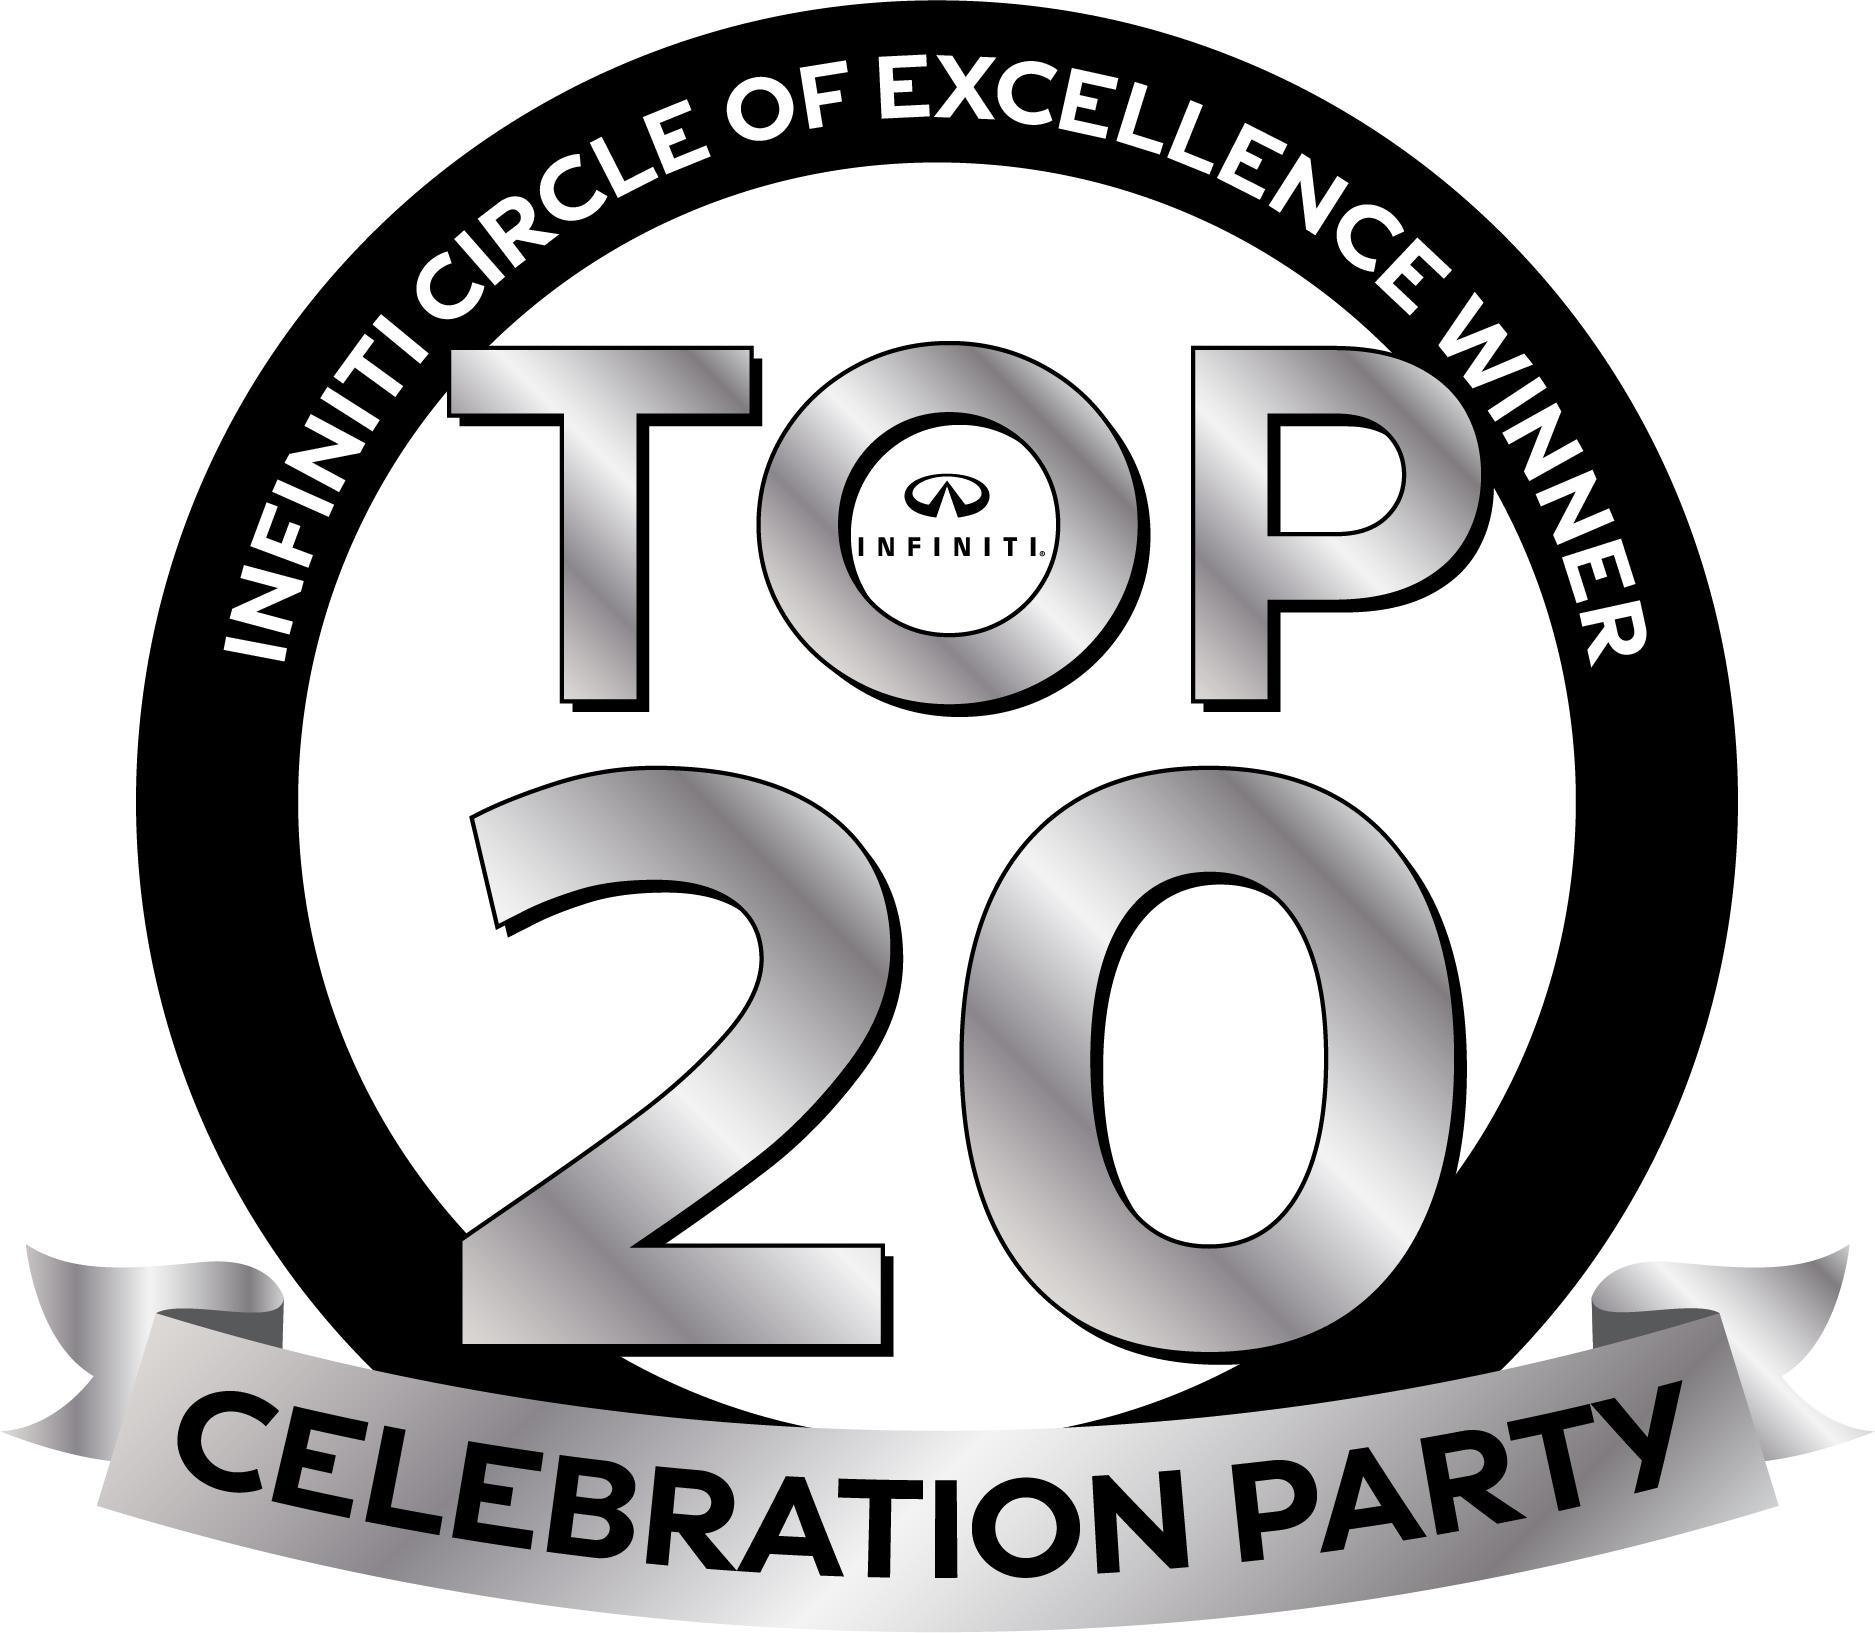 INFINITI Top 20 Celebration Party